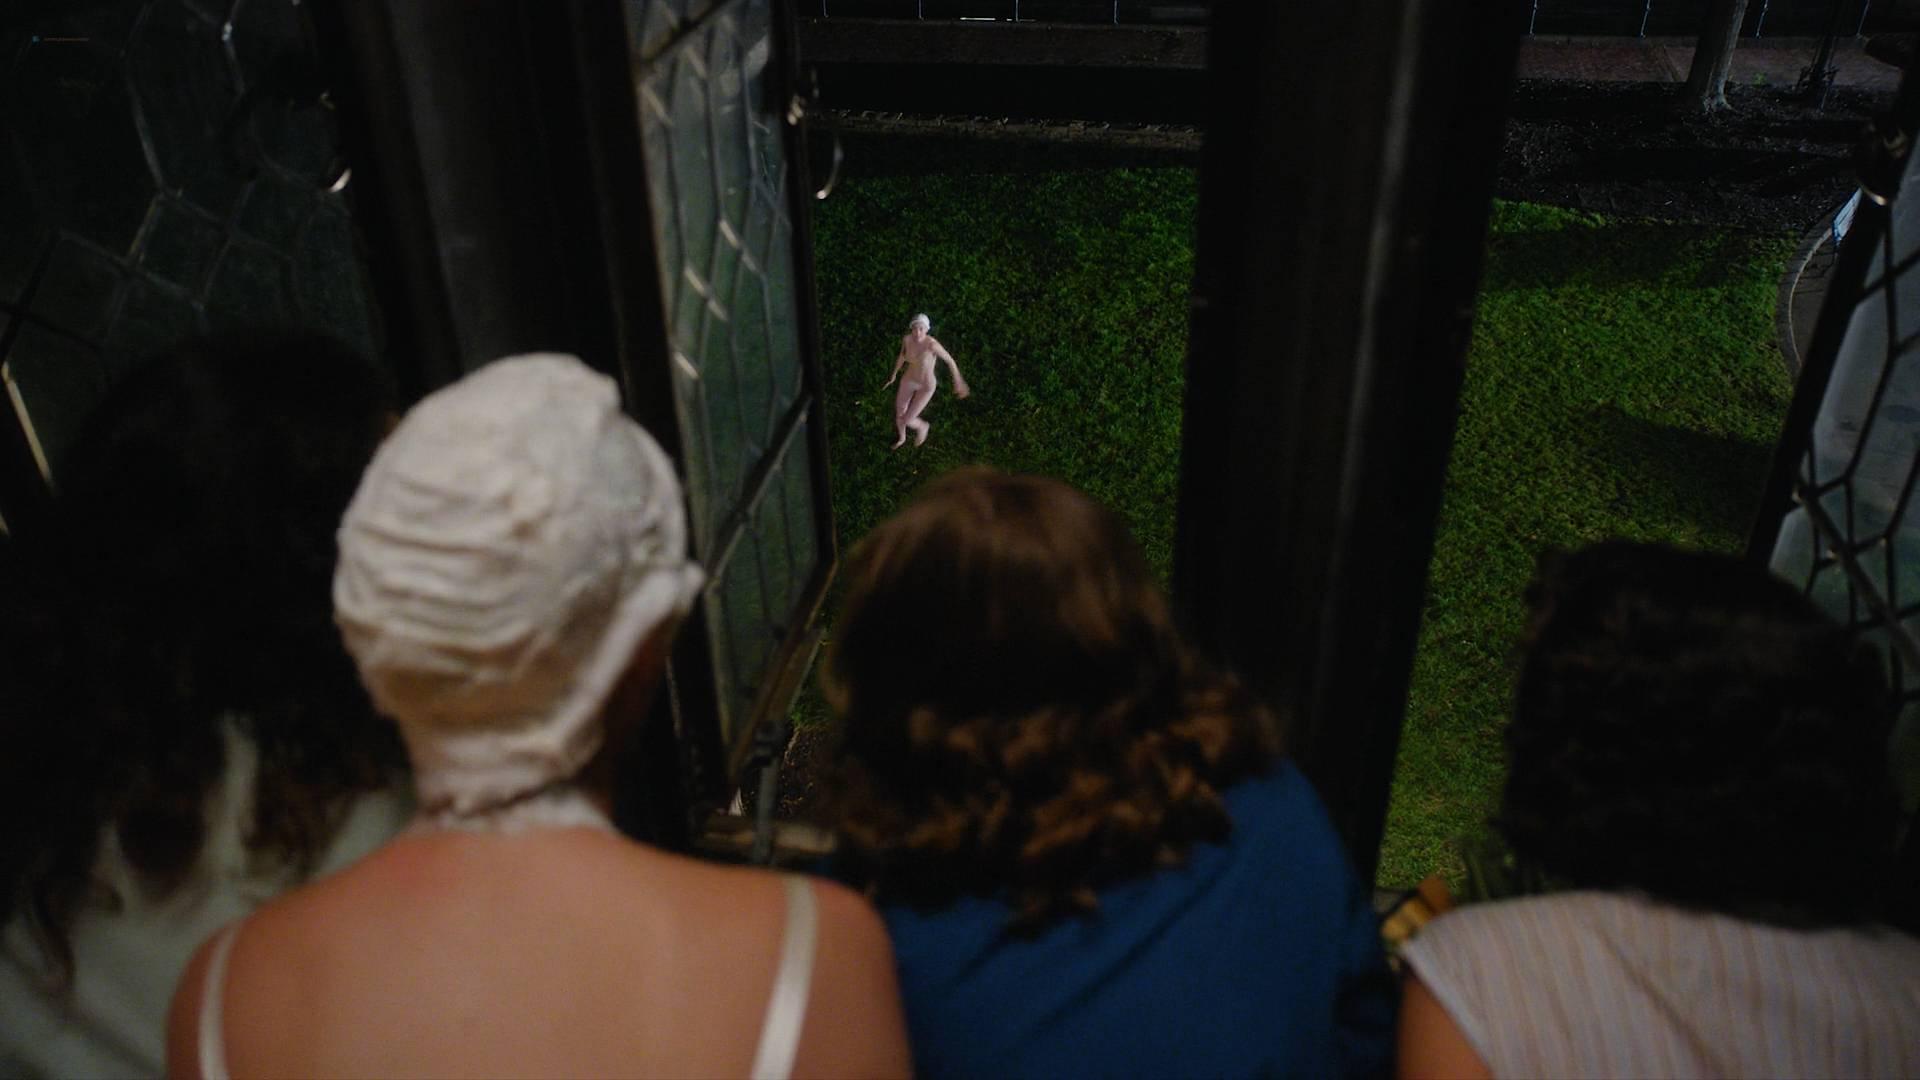 Rachel-Brosnahan-nude-topless-and-butt-Kyla-Walker-hot-The-Marvelous-Mrs-Maisel-2017-s1e1-HD-1080p-00004.jpg